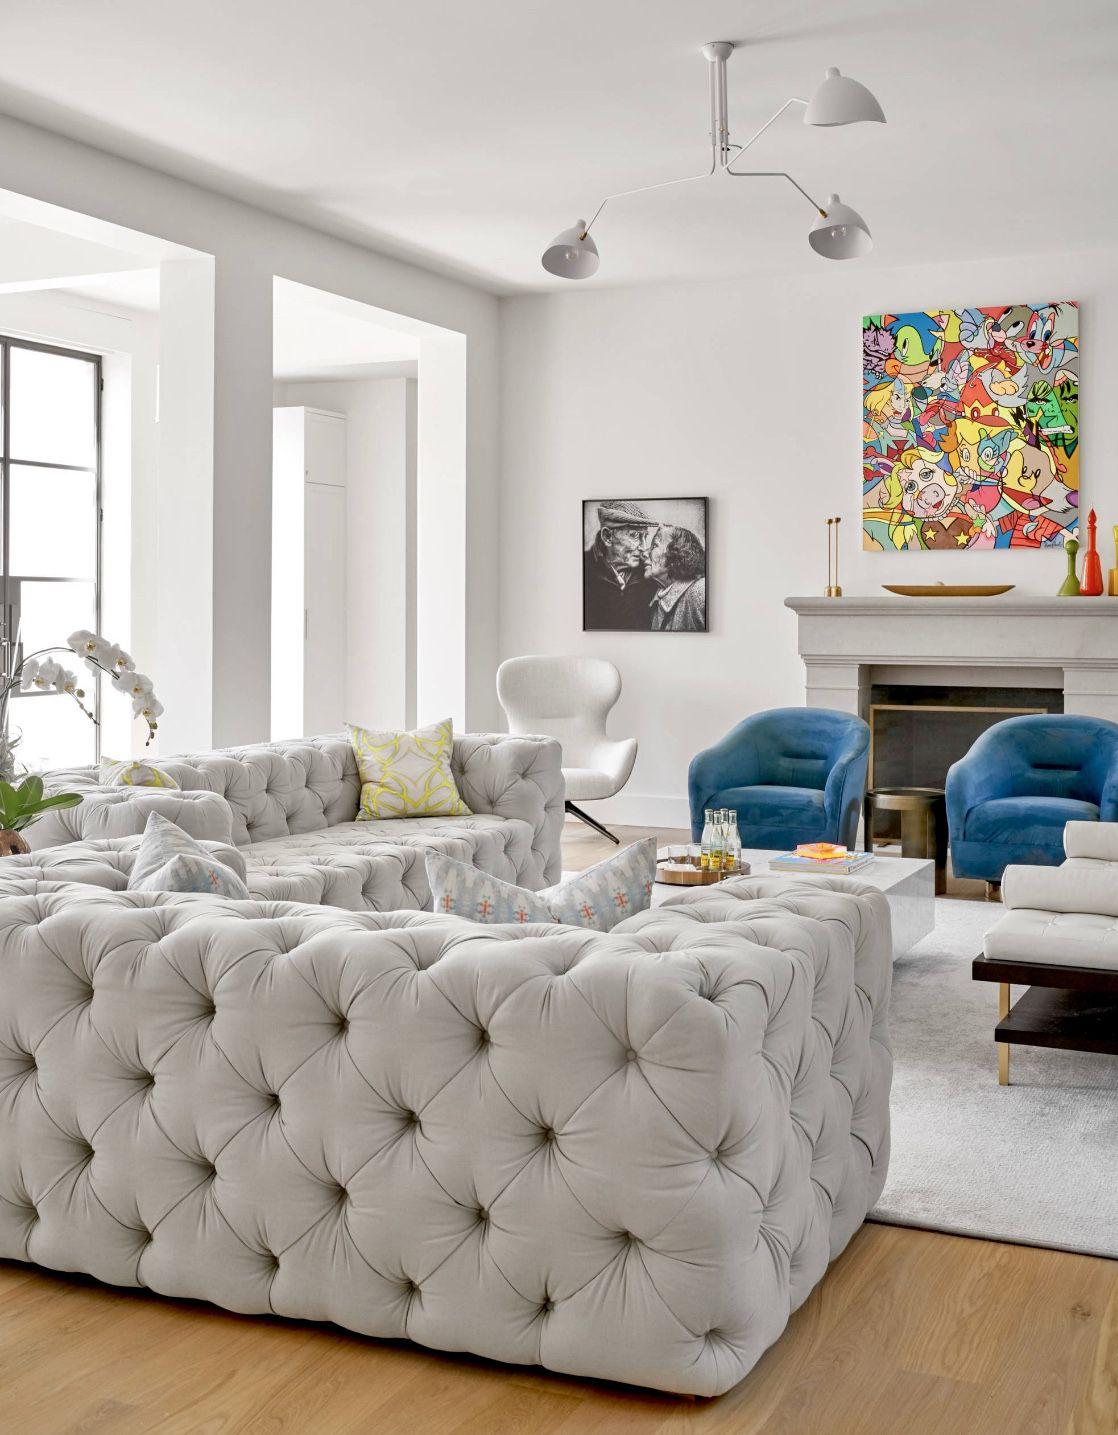 Sensational Restoration Hardware Soho Sofa Replica I Midcentury Caraccident5 Cool Chair Designs And Ideas Caraccident5Info